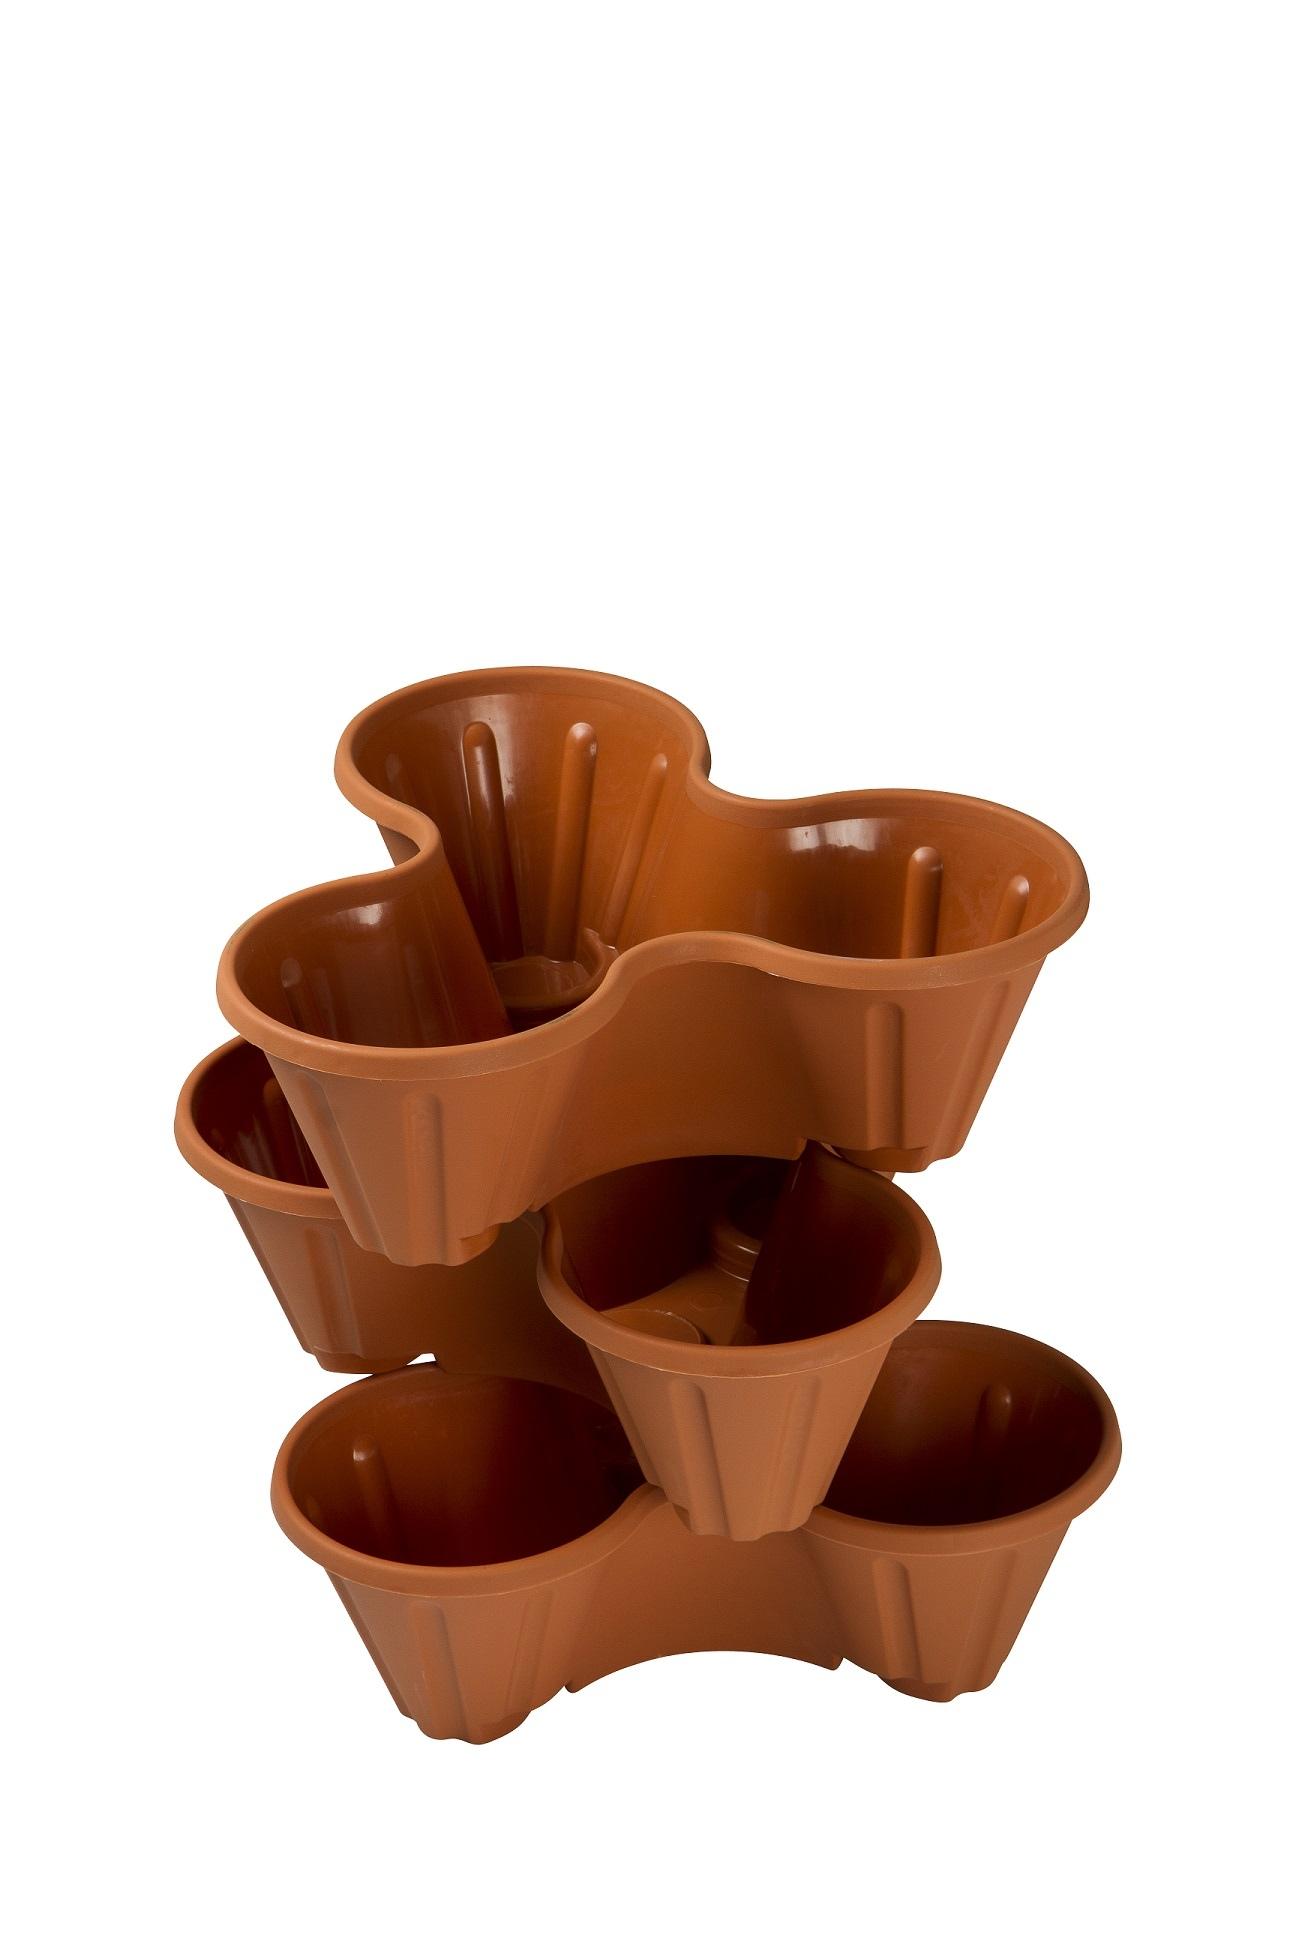 empilable plastique 3 plantes pots de fleurs pot support fraises herbe ebay. Black Bedroom Furniture Sets. Home Design Ideas